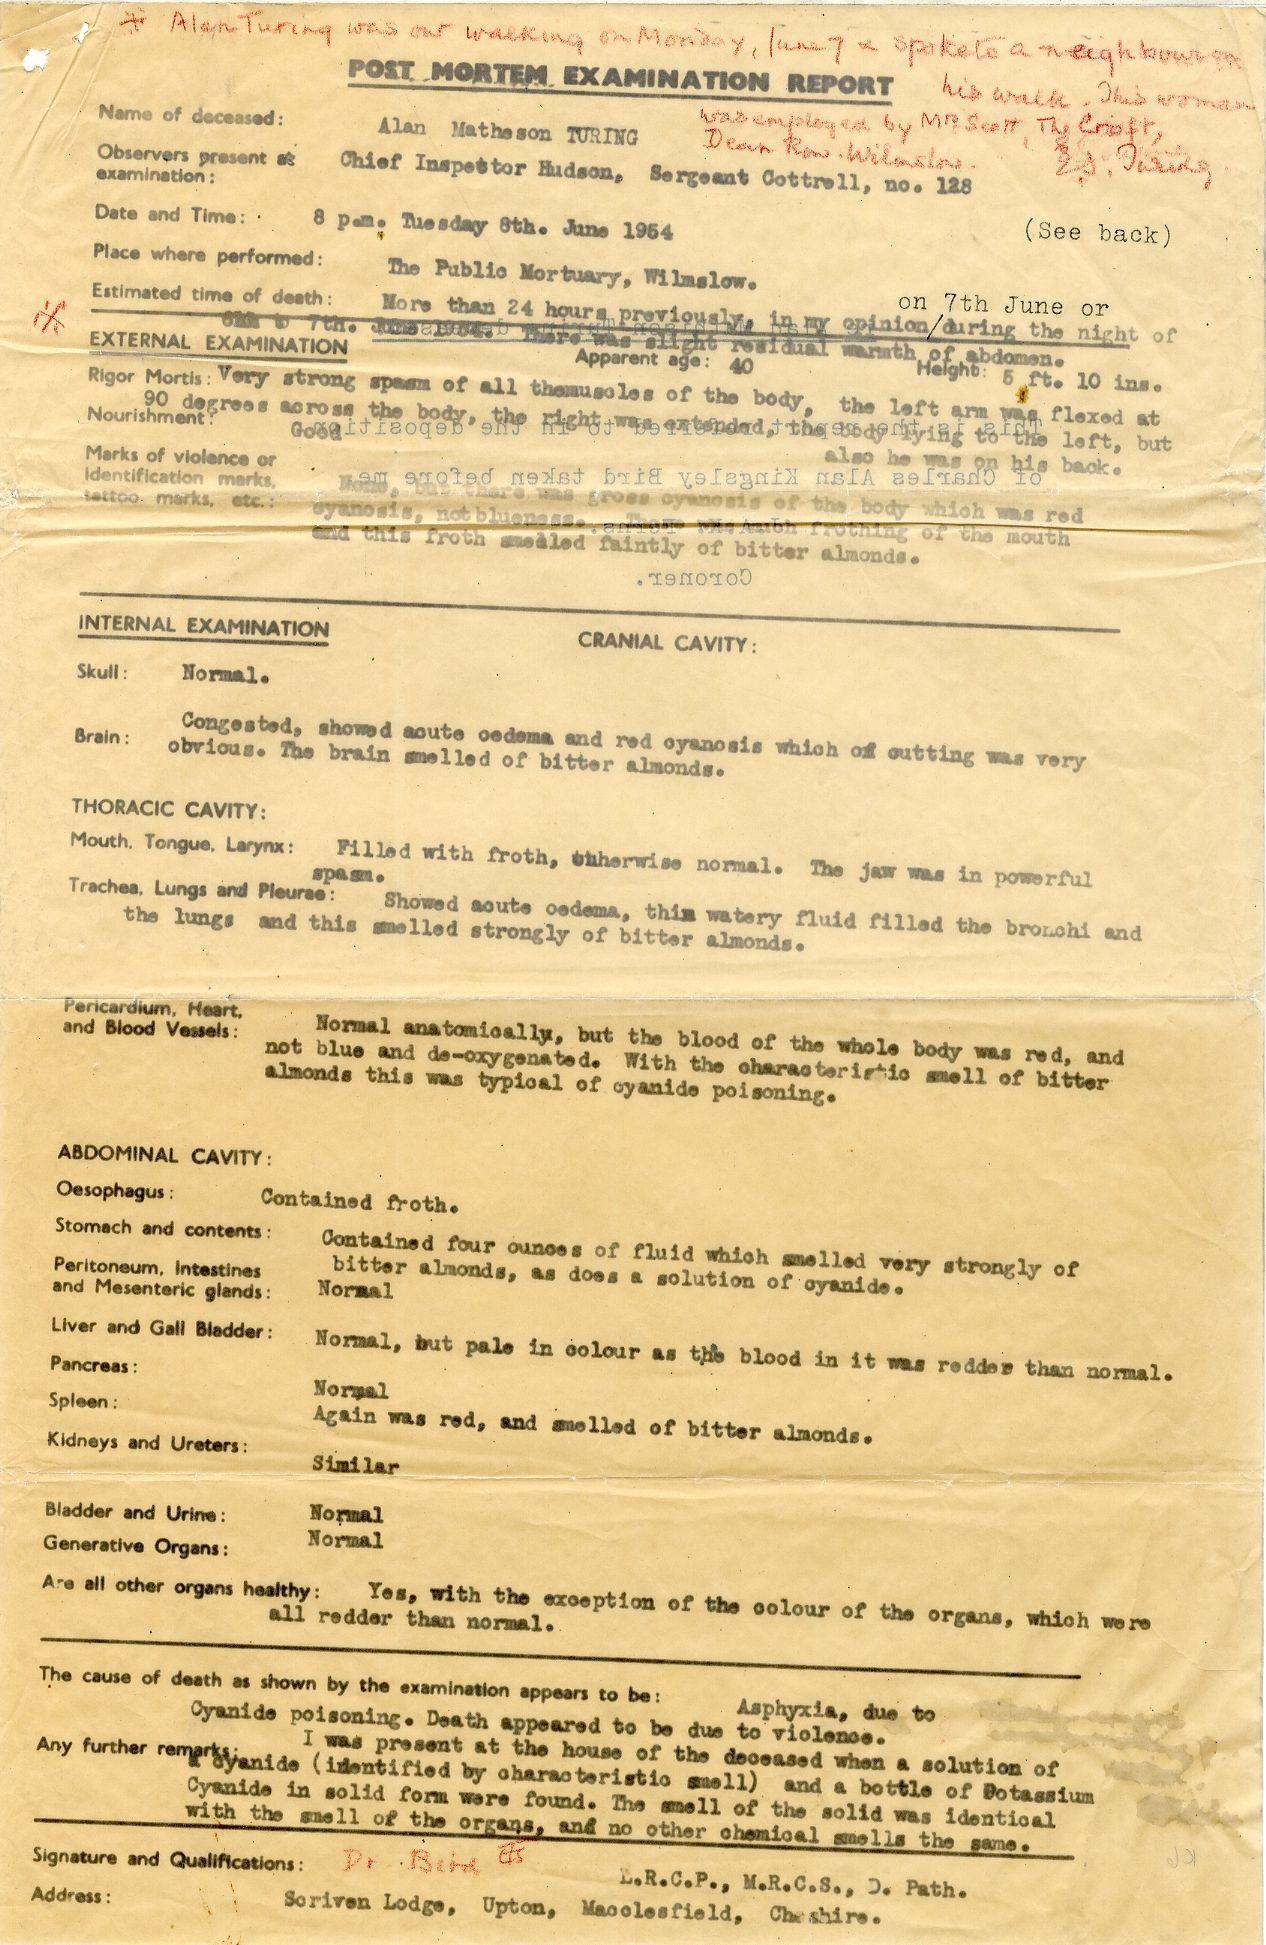 Post mortem examination report.  [AMT K/6]